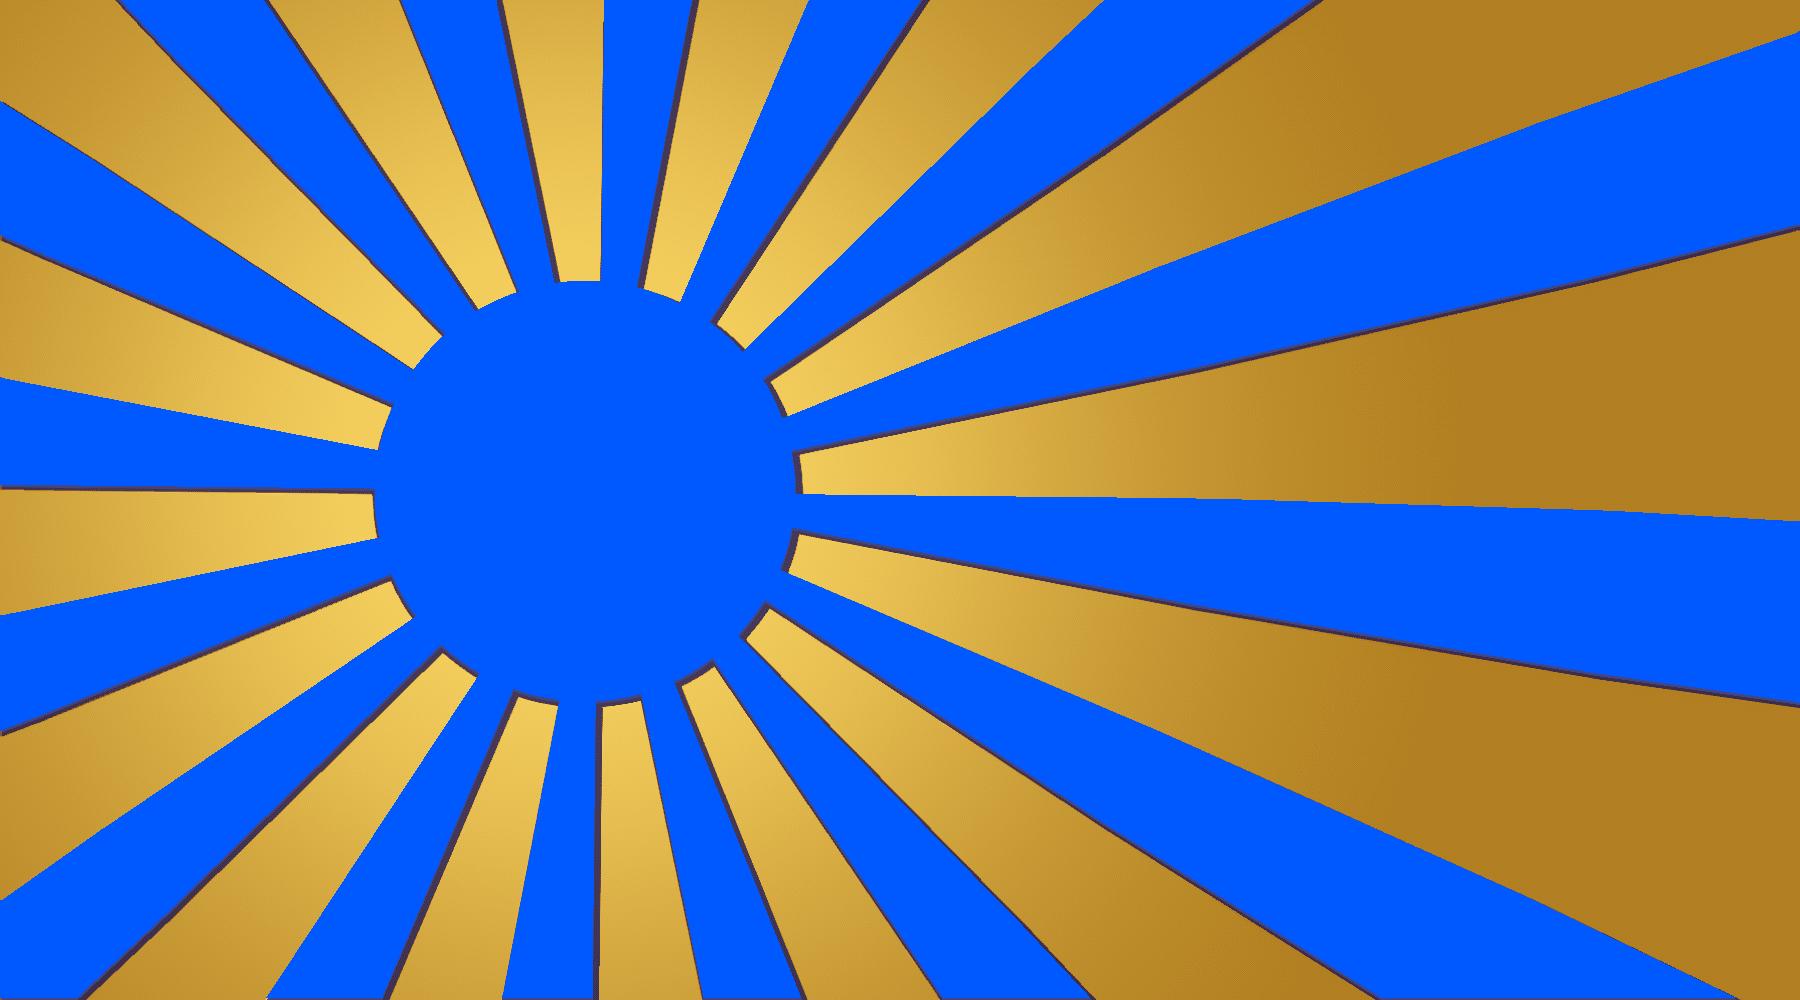 青色・金背景・立体的の旭日旗1800x1000